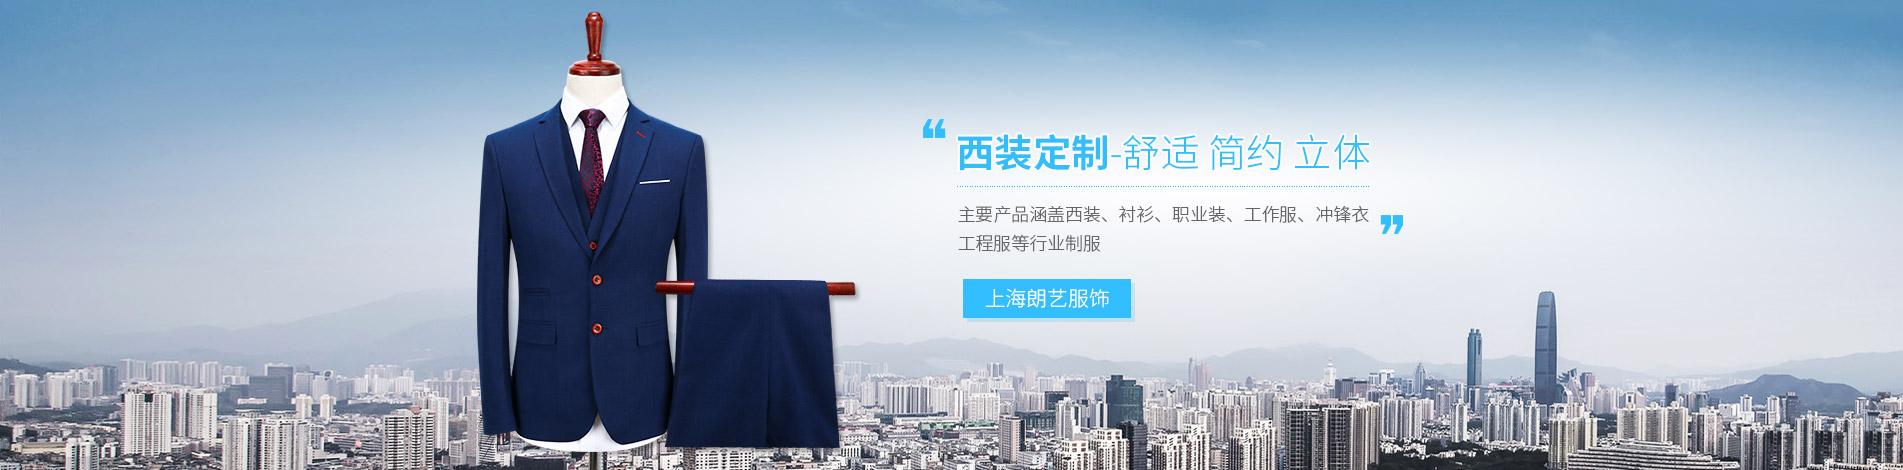 c_上海朗艺服饰有限公司